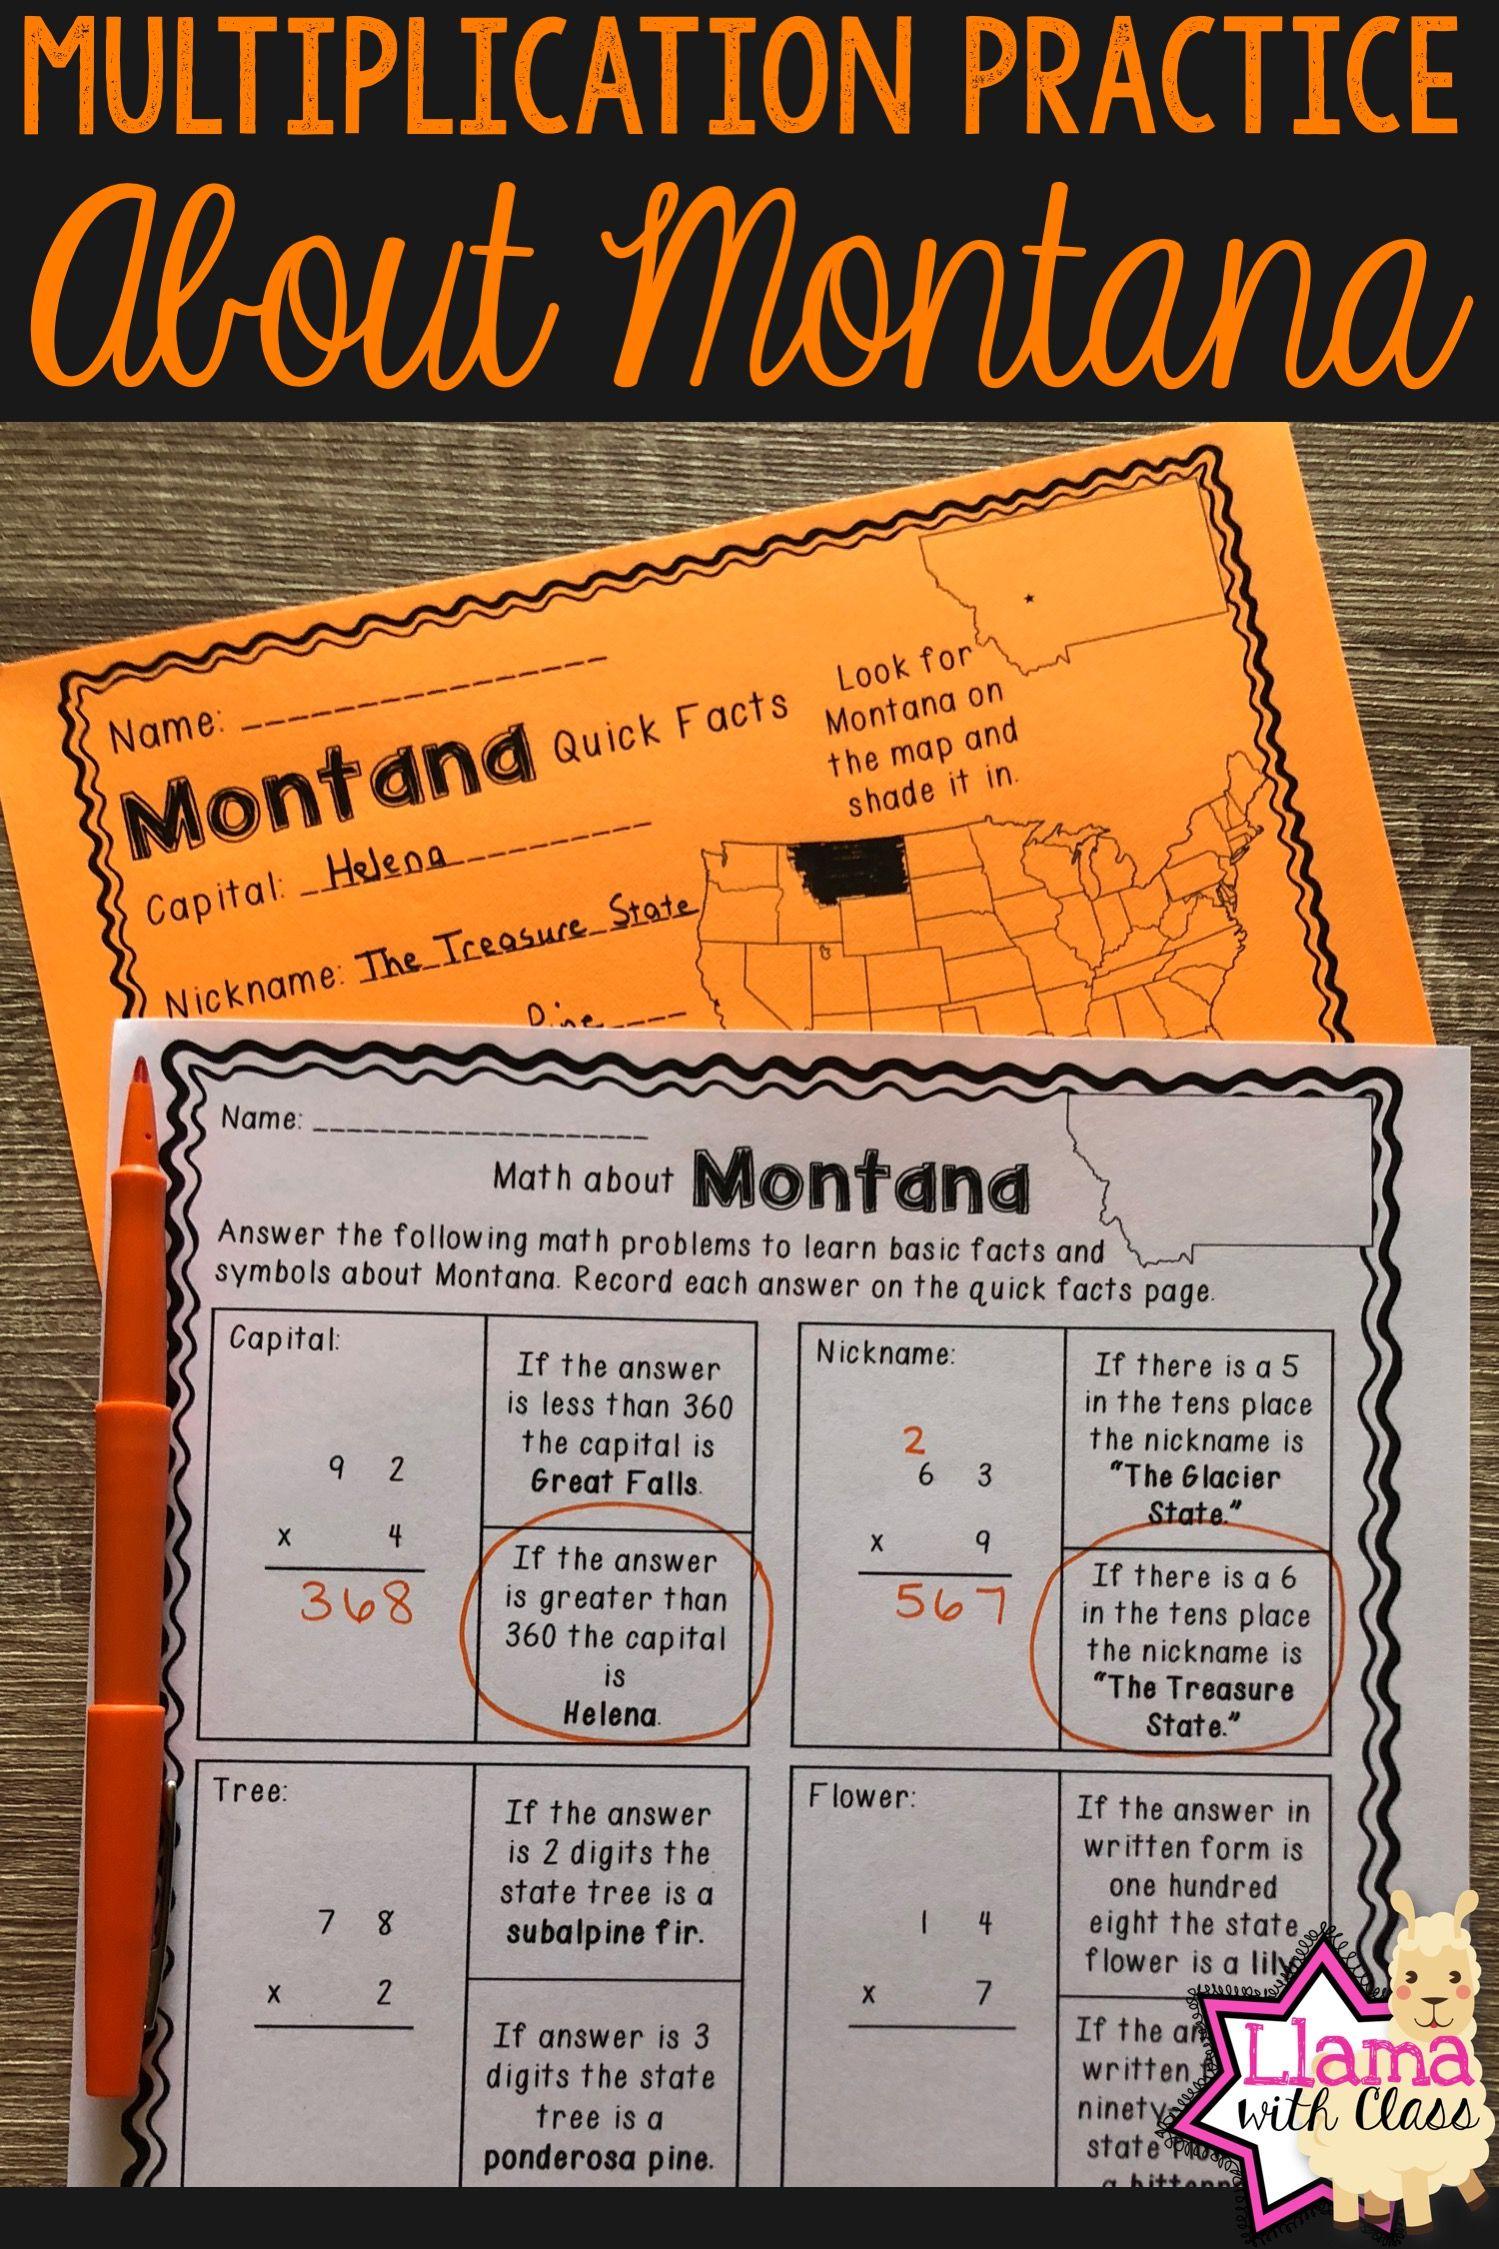 Math About Montana State Symbols Through Multiplication